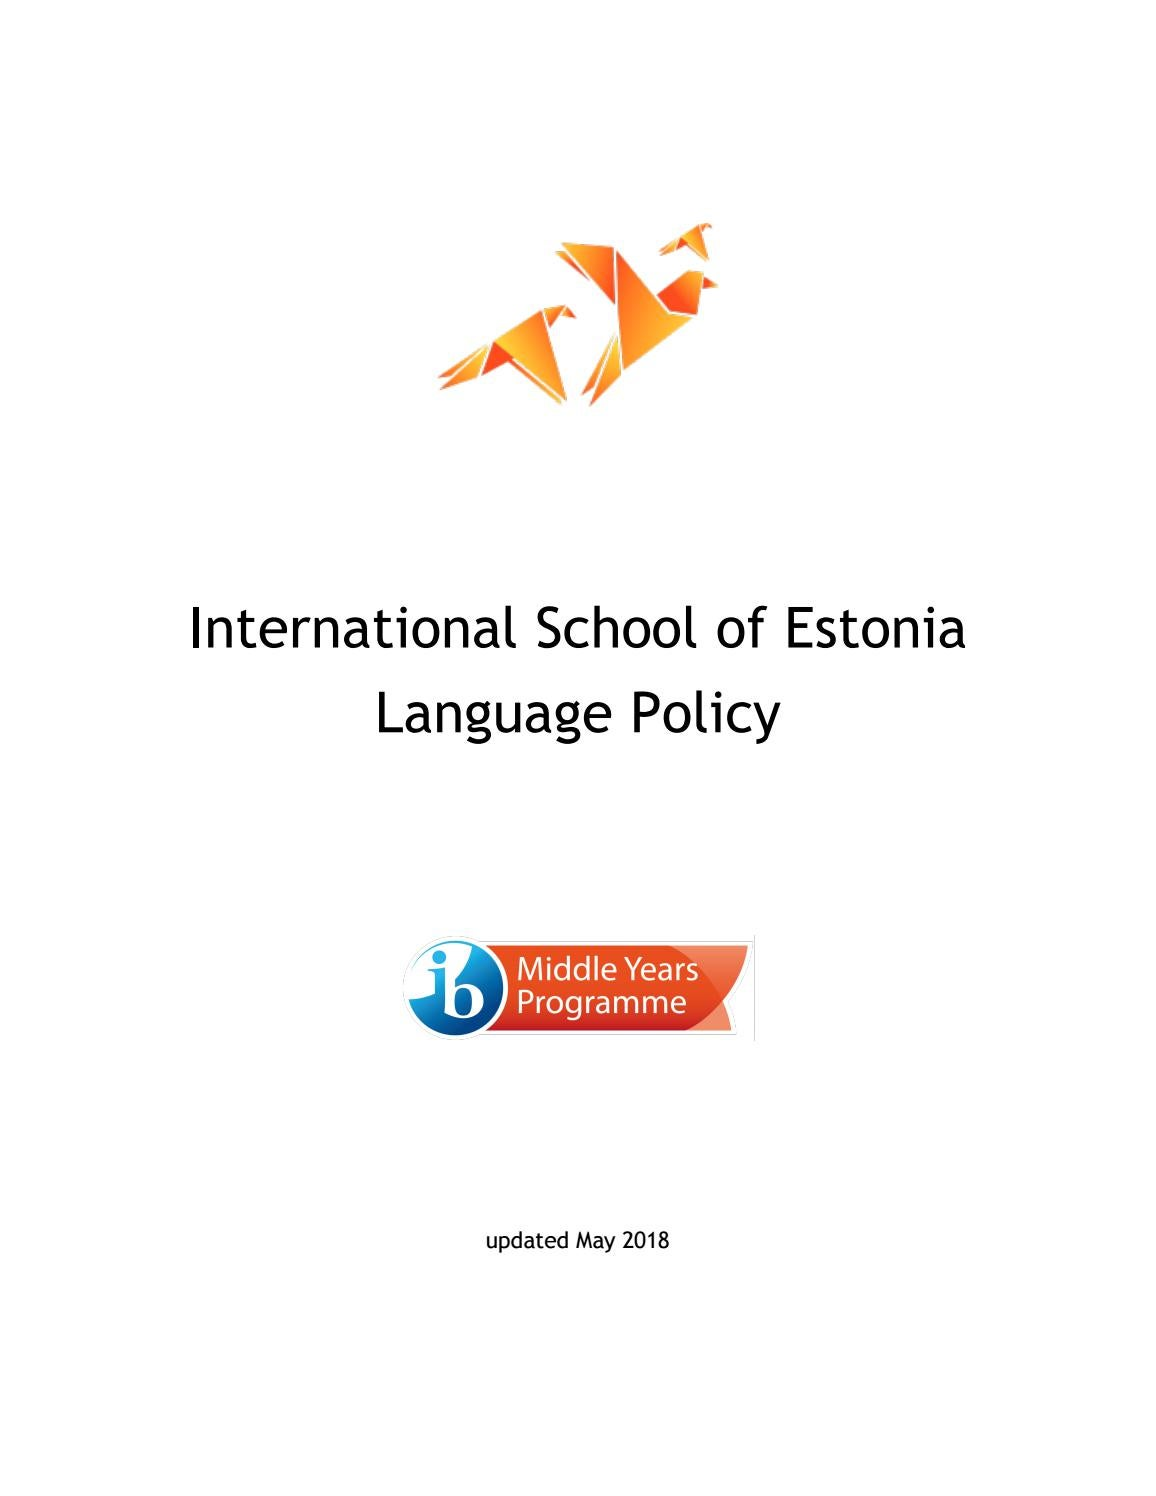 MYP Language Policy 2018 by International School of Estonia